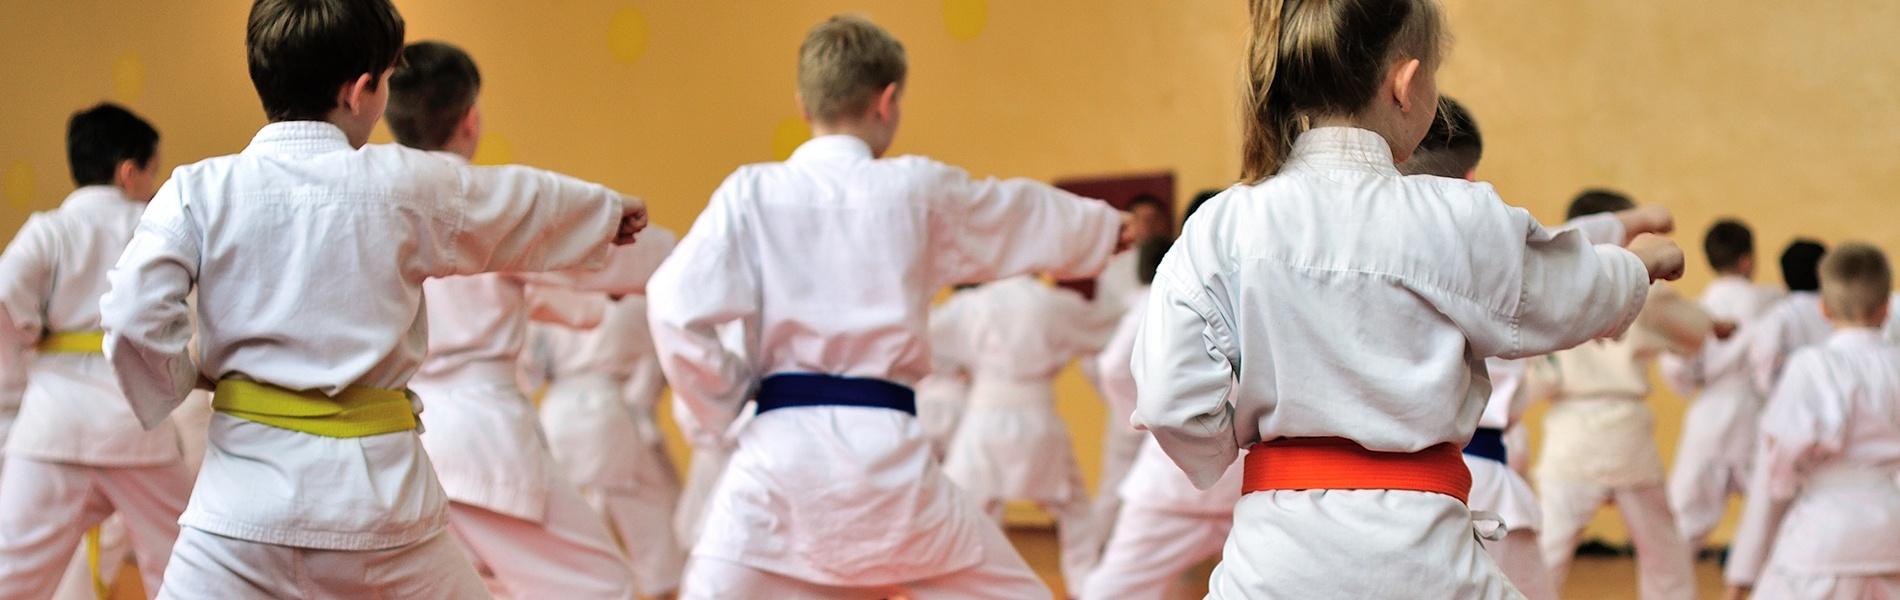 blog post-4 Tips to Help Grow Your Martial Arts School  .jpg